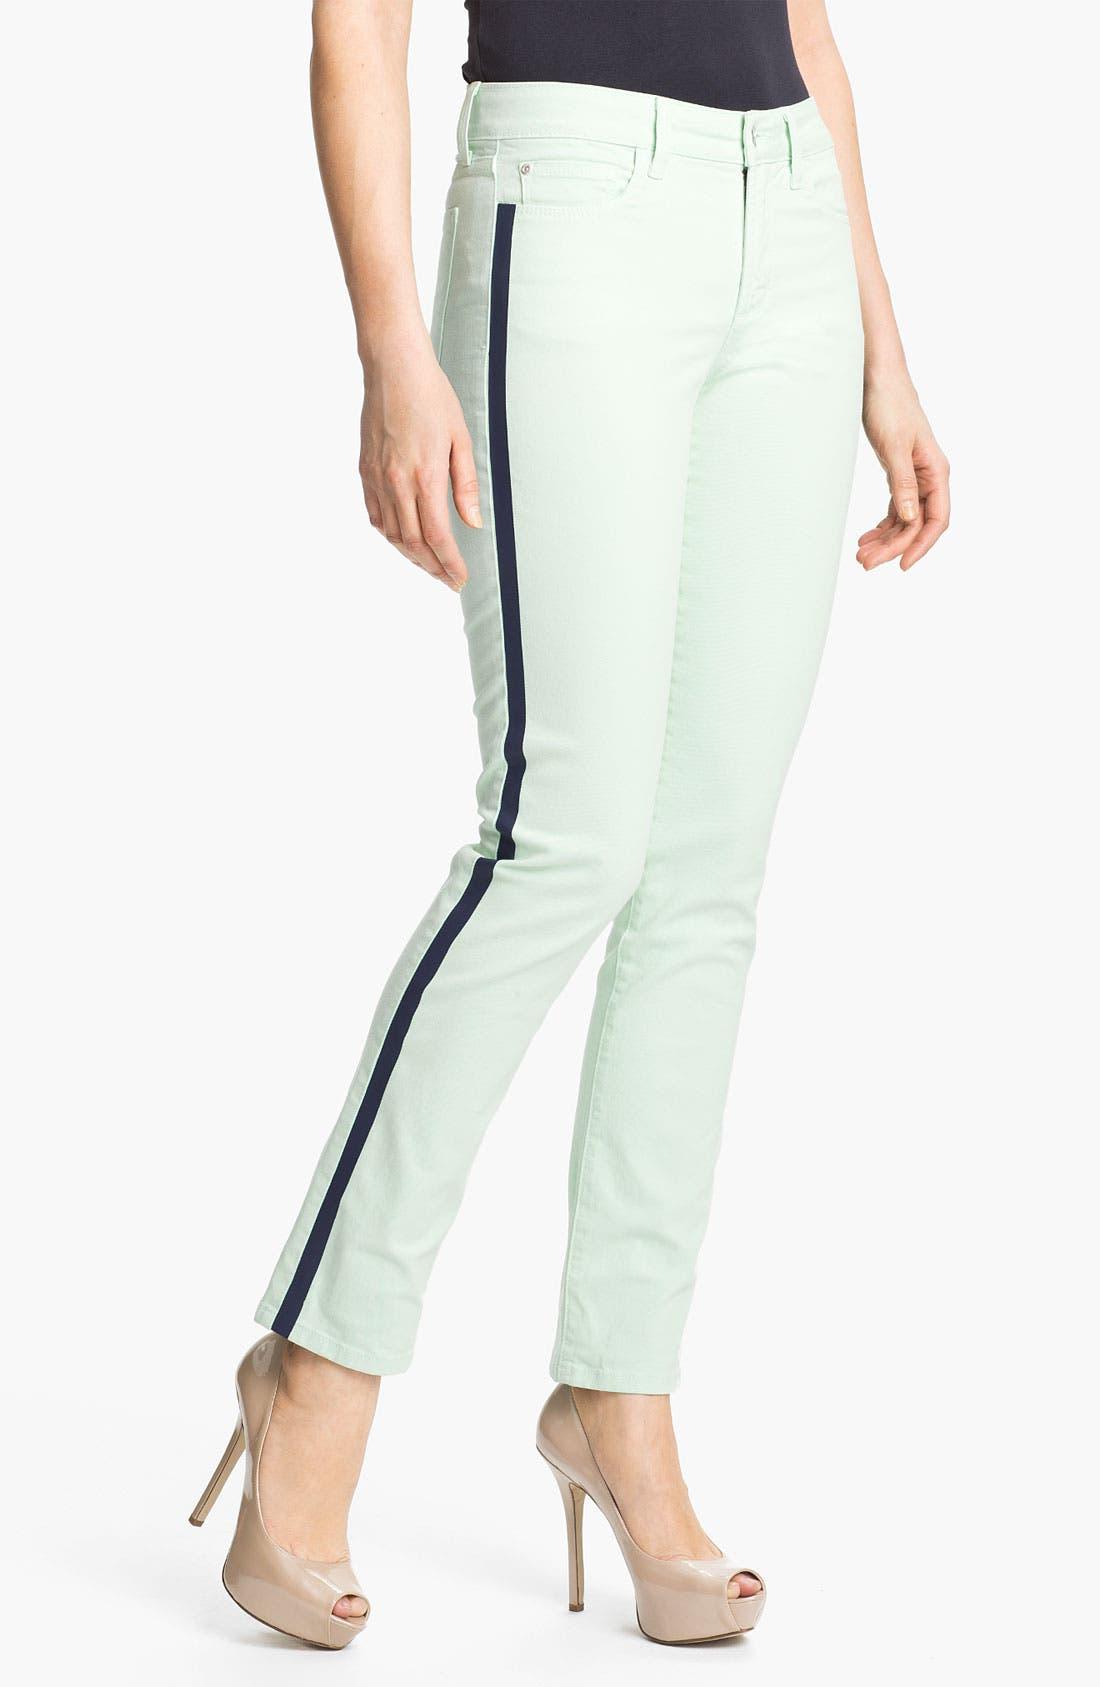 Main Image - NYDJ 'Sheri - Tuxedo' Skinny Stretch Jeans